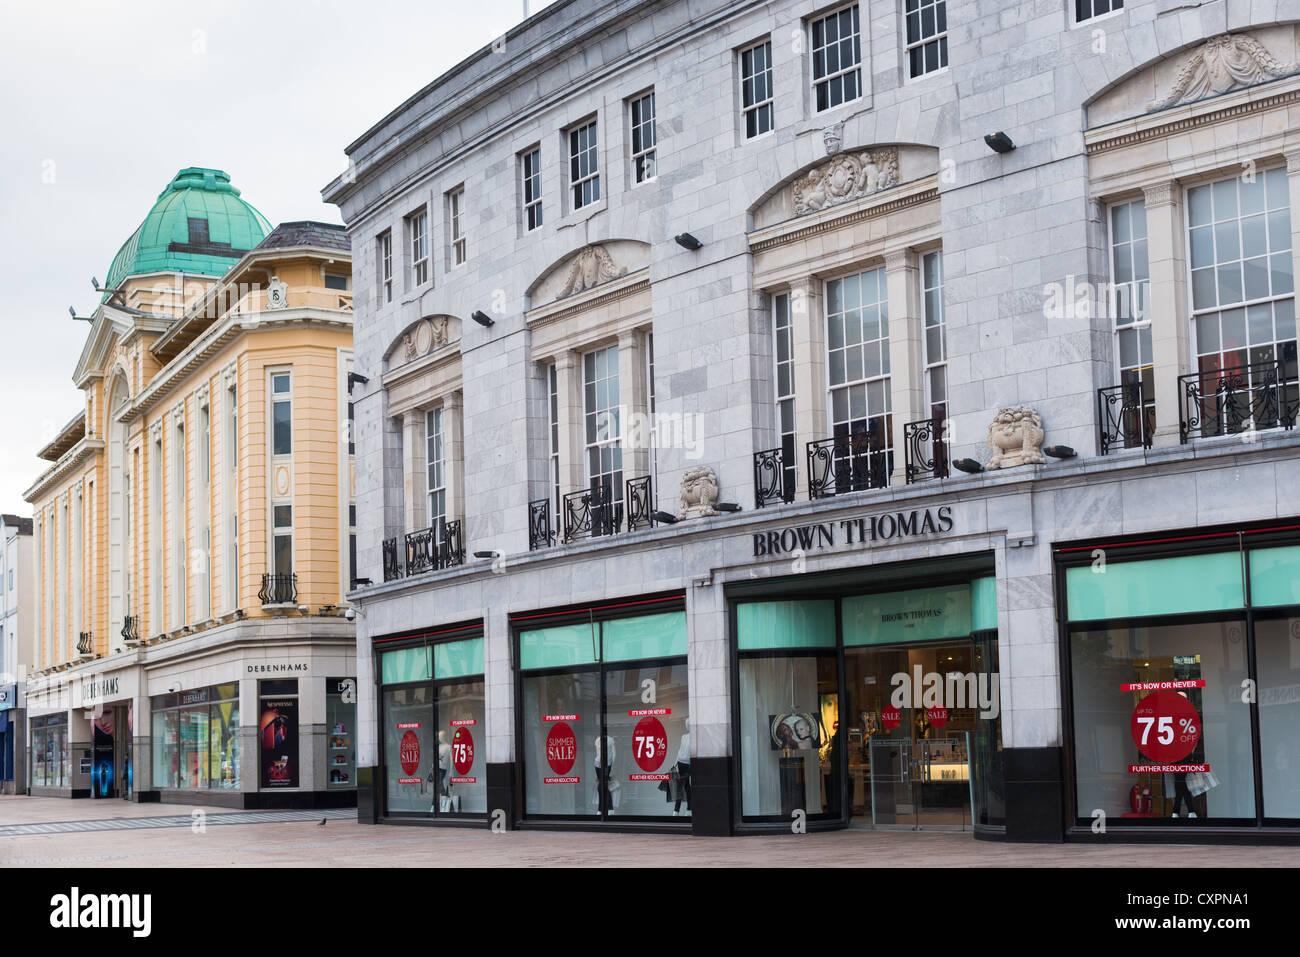 Department stores on St Patrick's Street, Cork City Centre, Republic of Ireland. - Stock Image